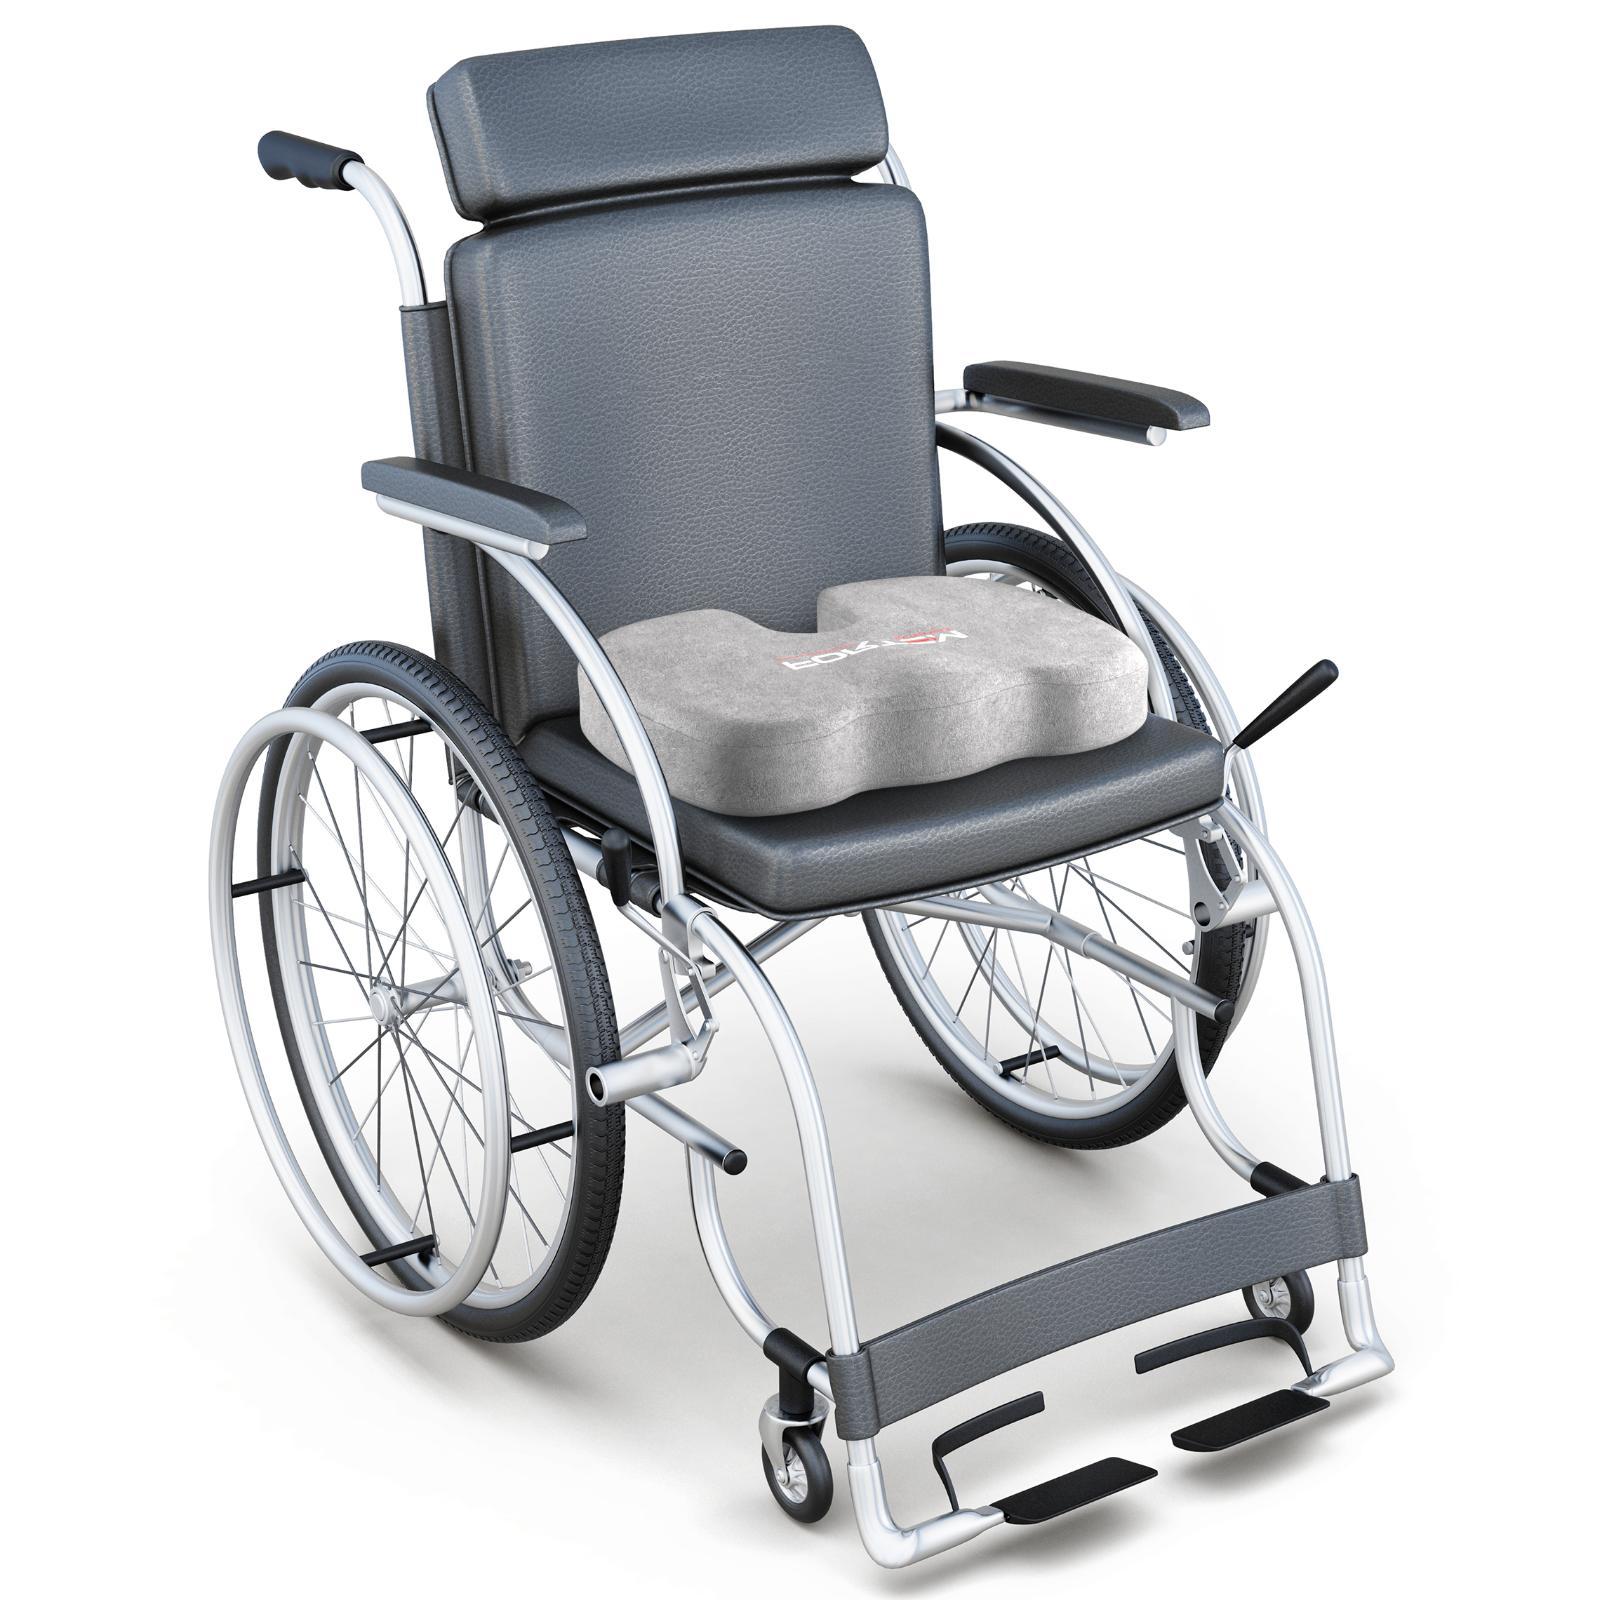 Premium Quality Orthopedic Memory Foam Seat by FORTEM